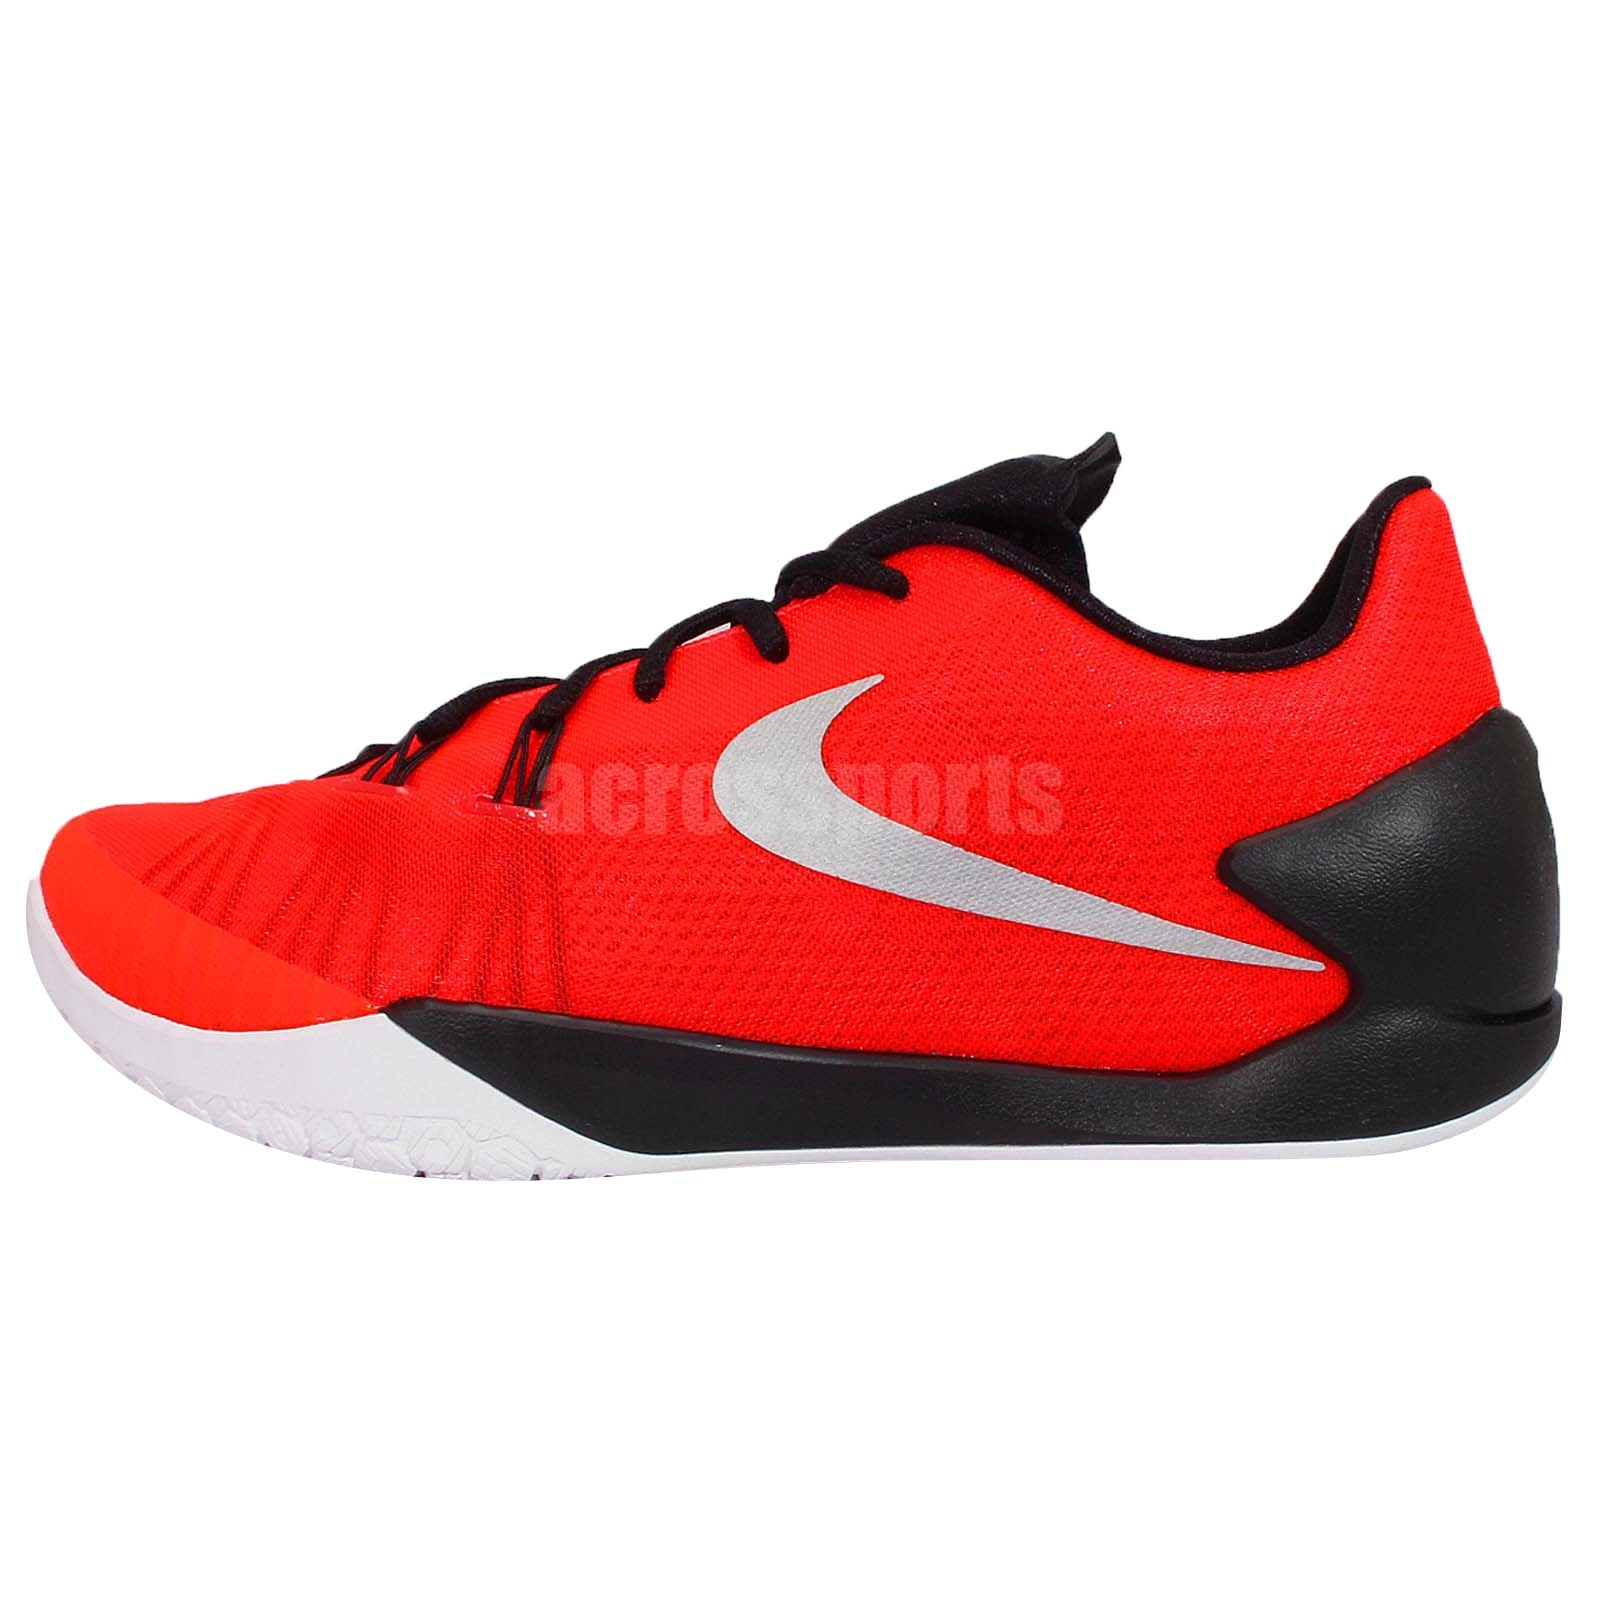 Hyperchase Basketball Shoes